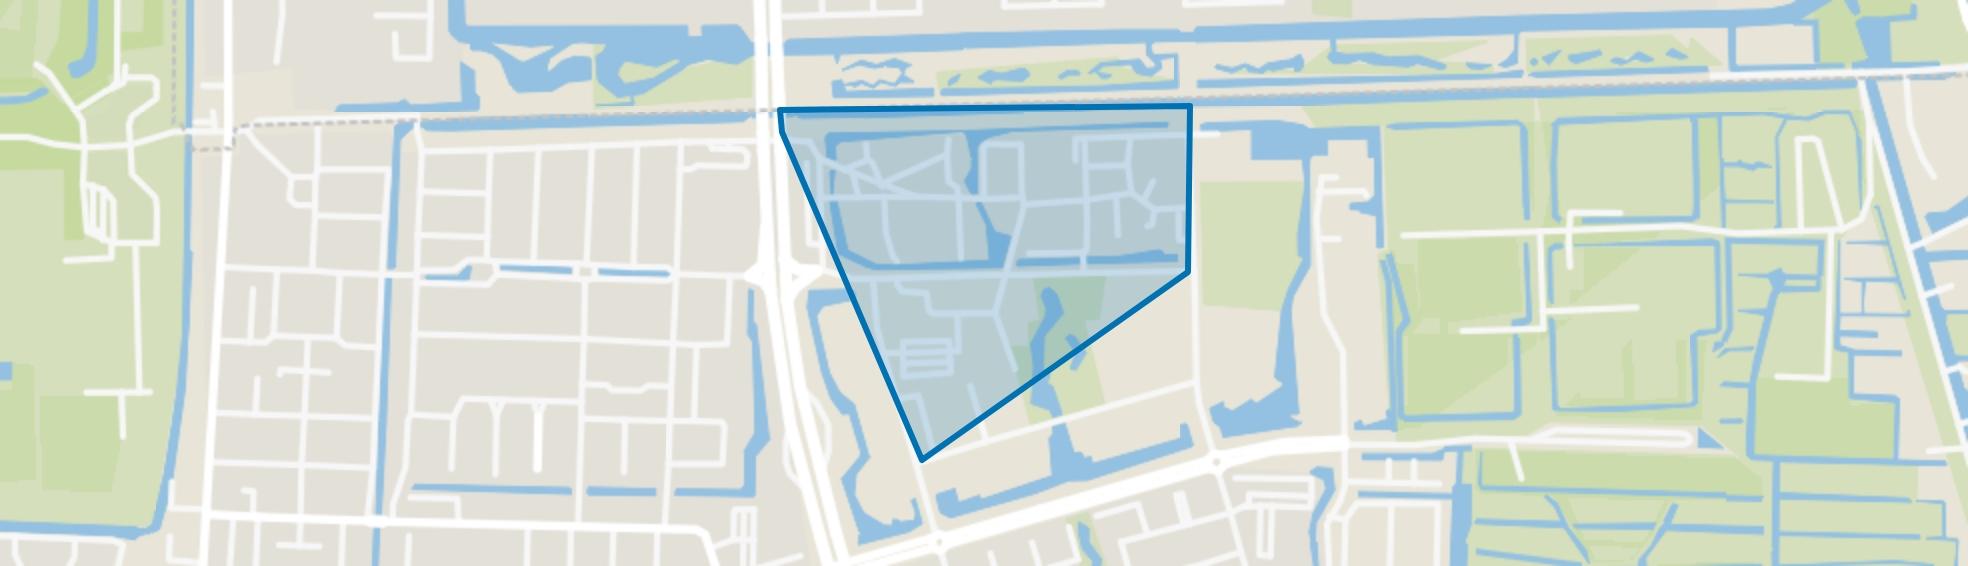 Uilenstede, Amstelveen map